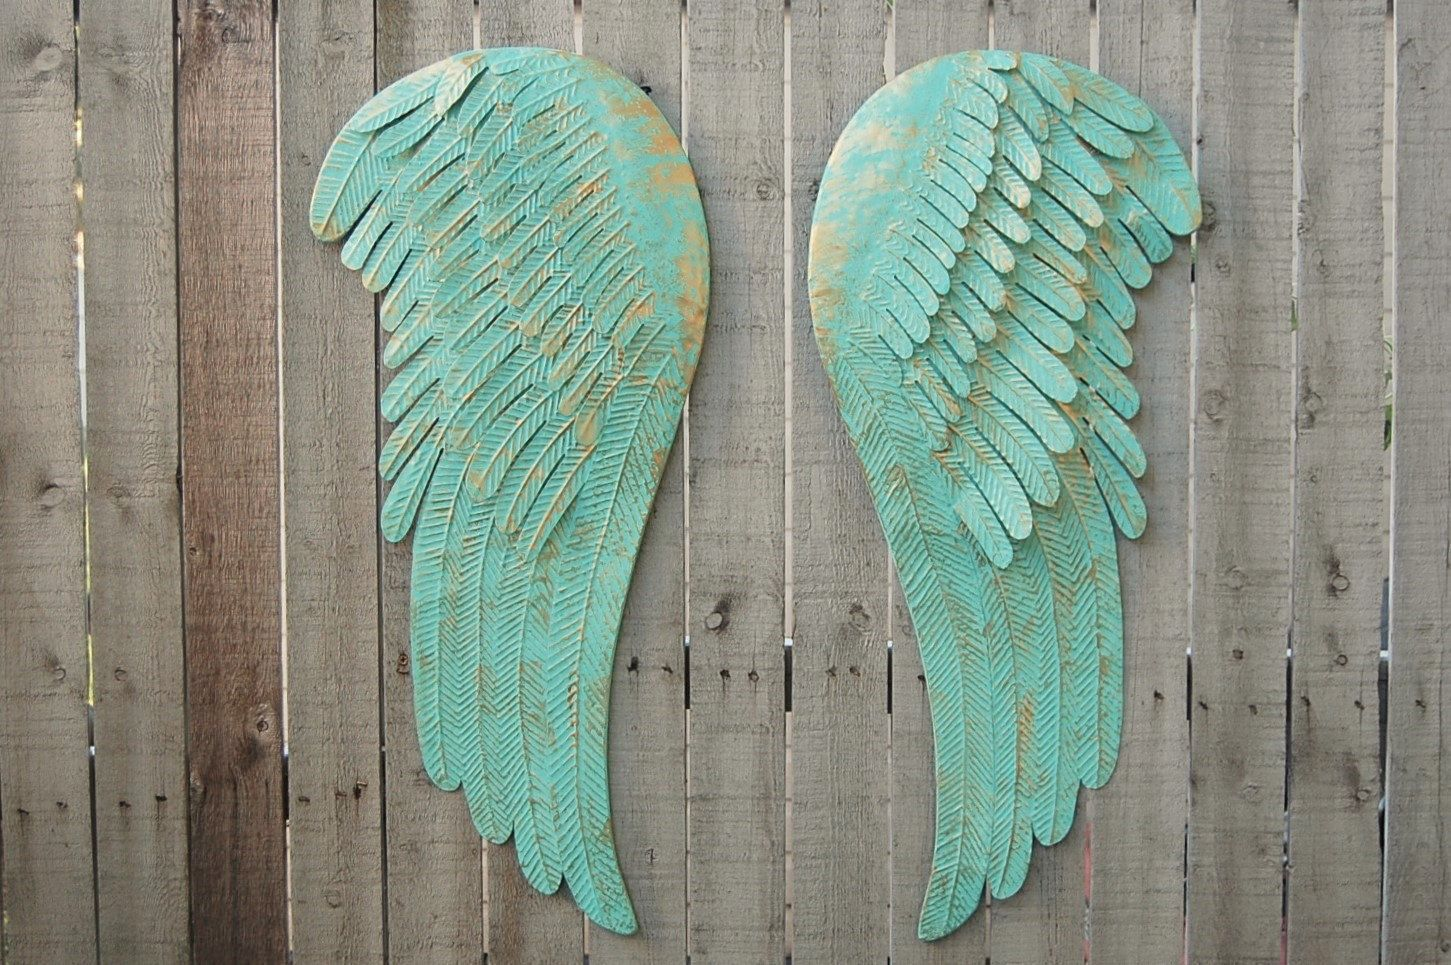 Large Angel Wings Wall Decor Shabby Chic Aqua Gold Metal